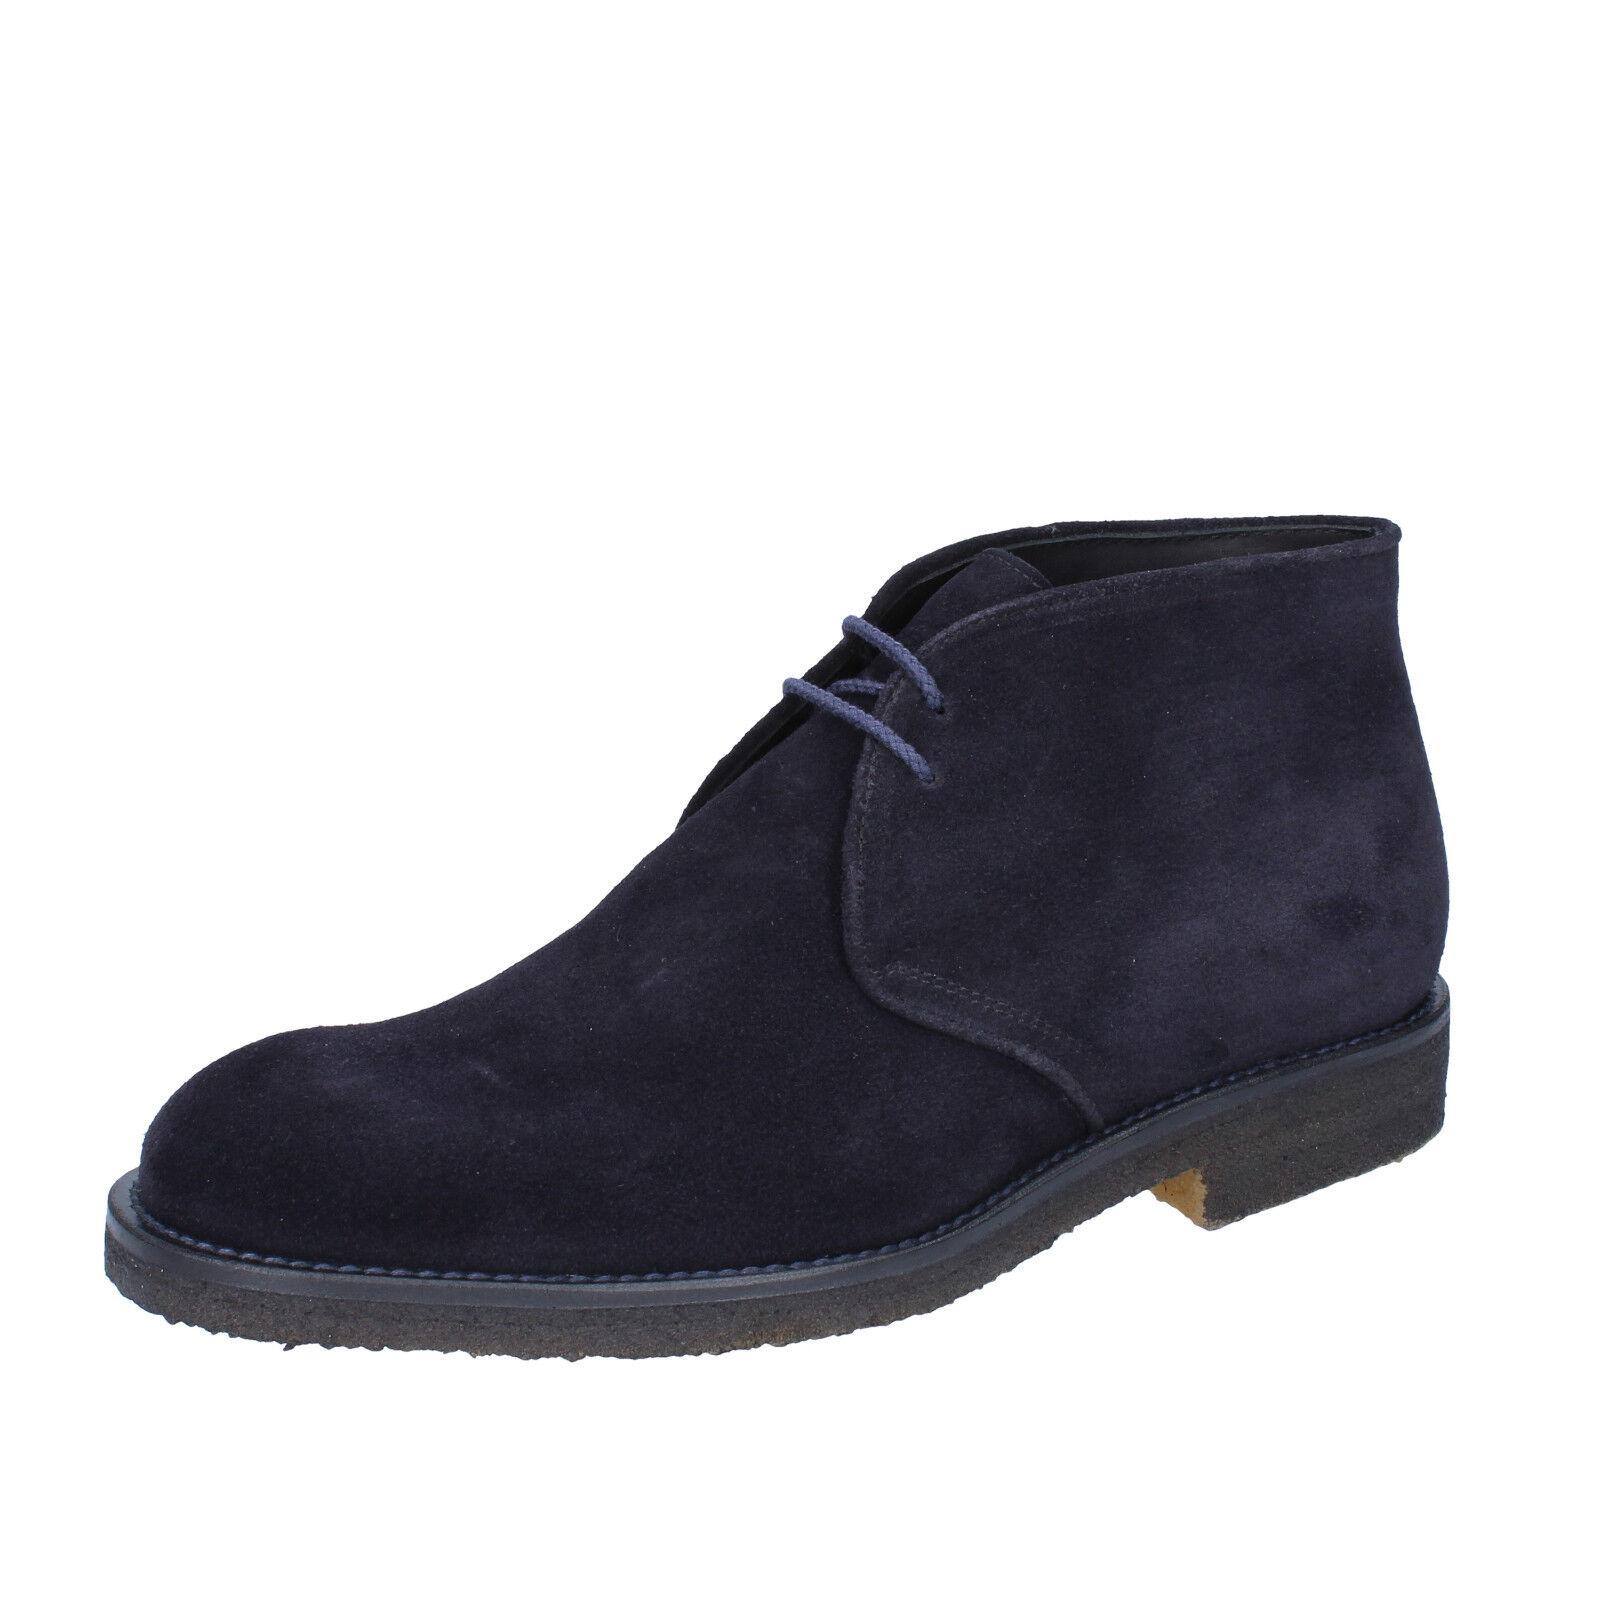 Mens shoes DI MELLA 7,5 (EU 41,5) desert boots bluee suede BZ09-D